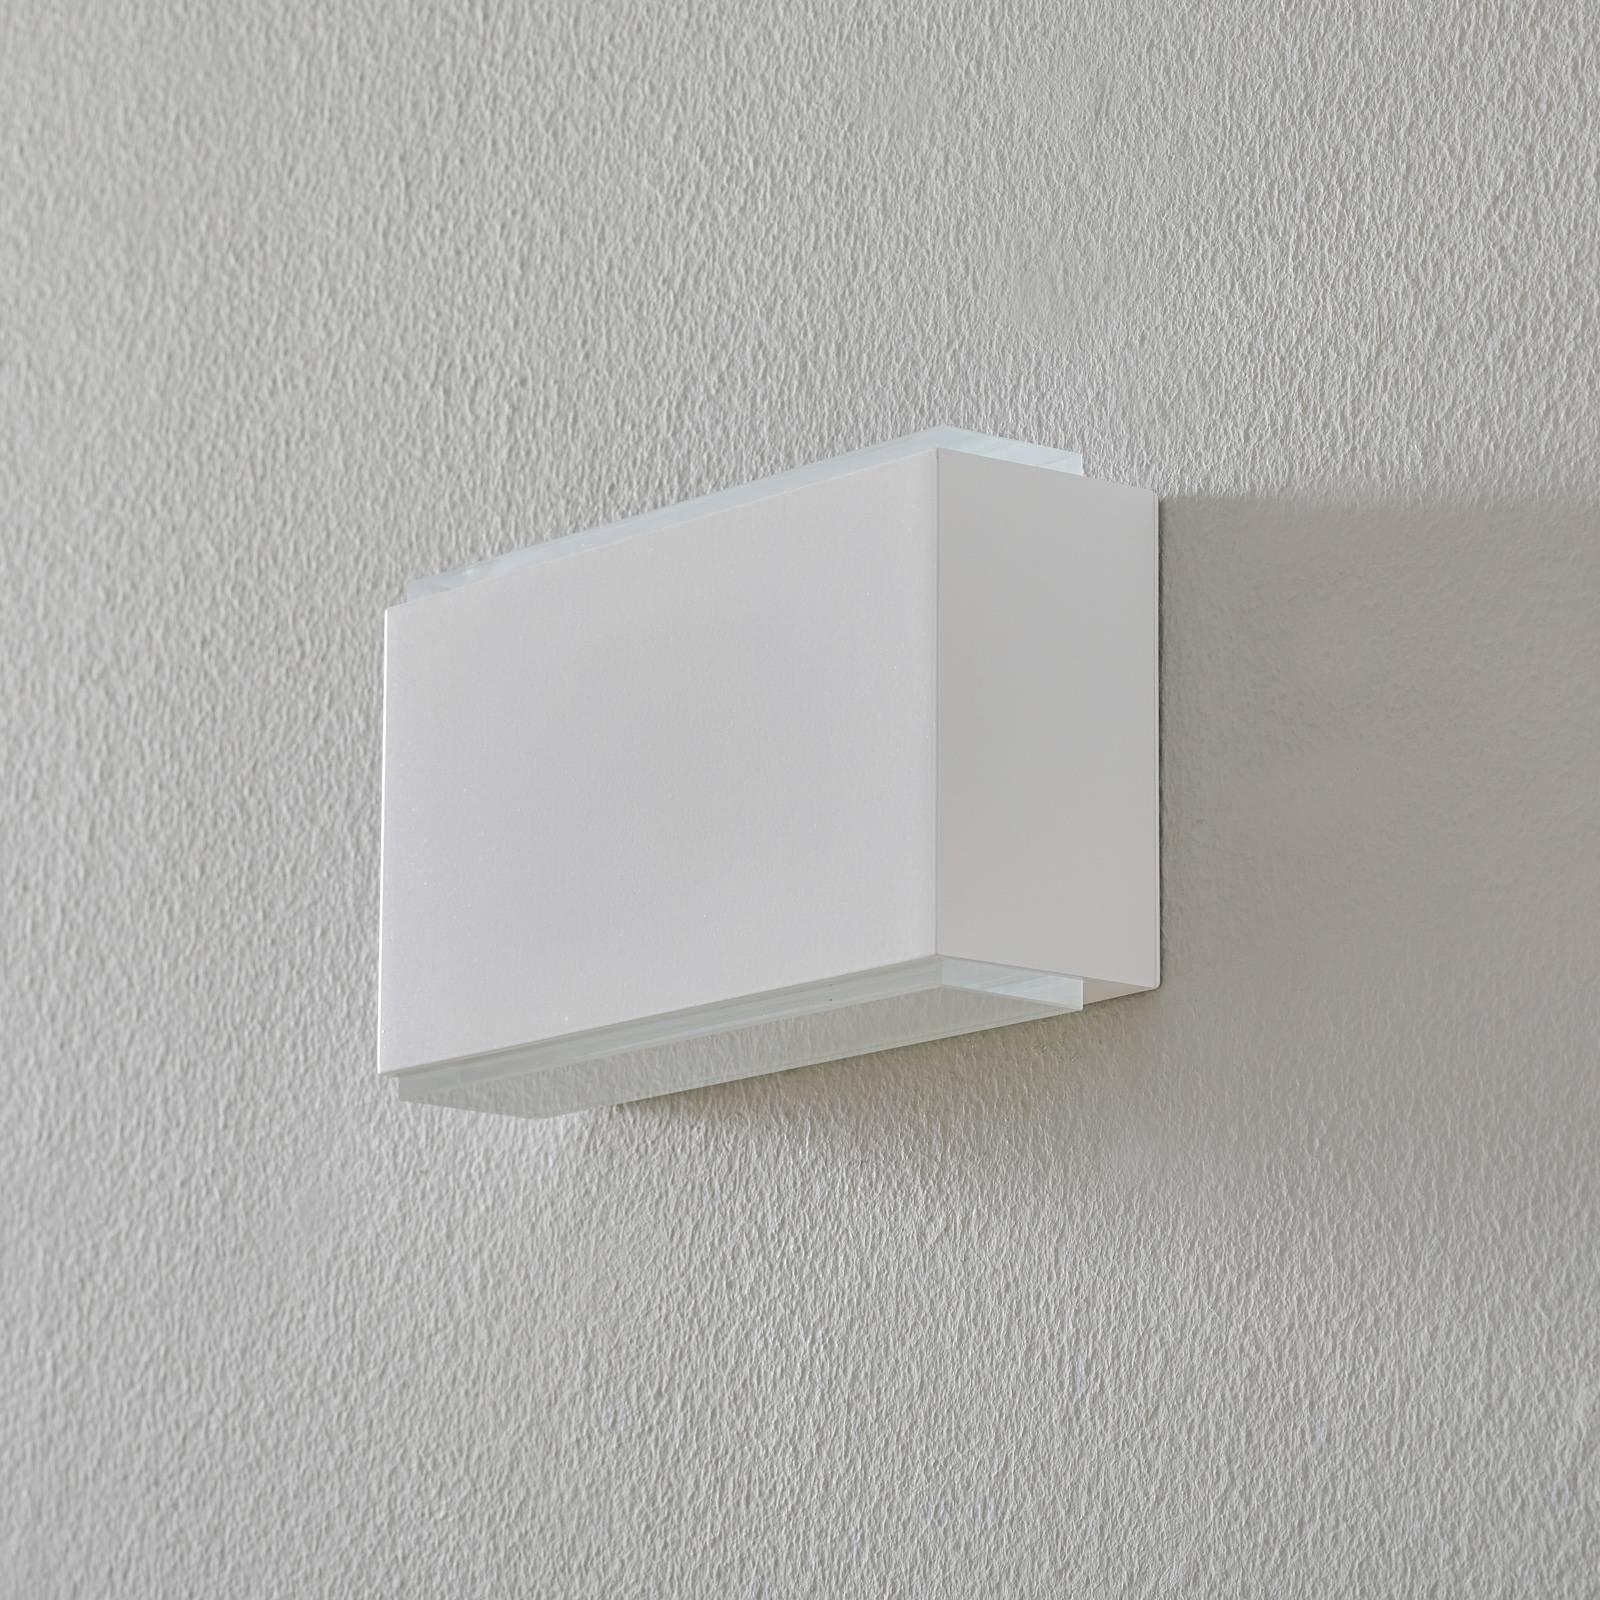 BEGA 50072 LED-vegglampe 3 000 K 18 cm hvit 1630lm